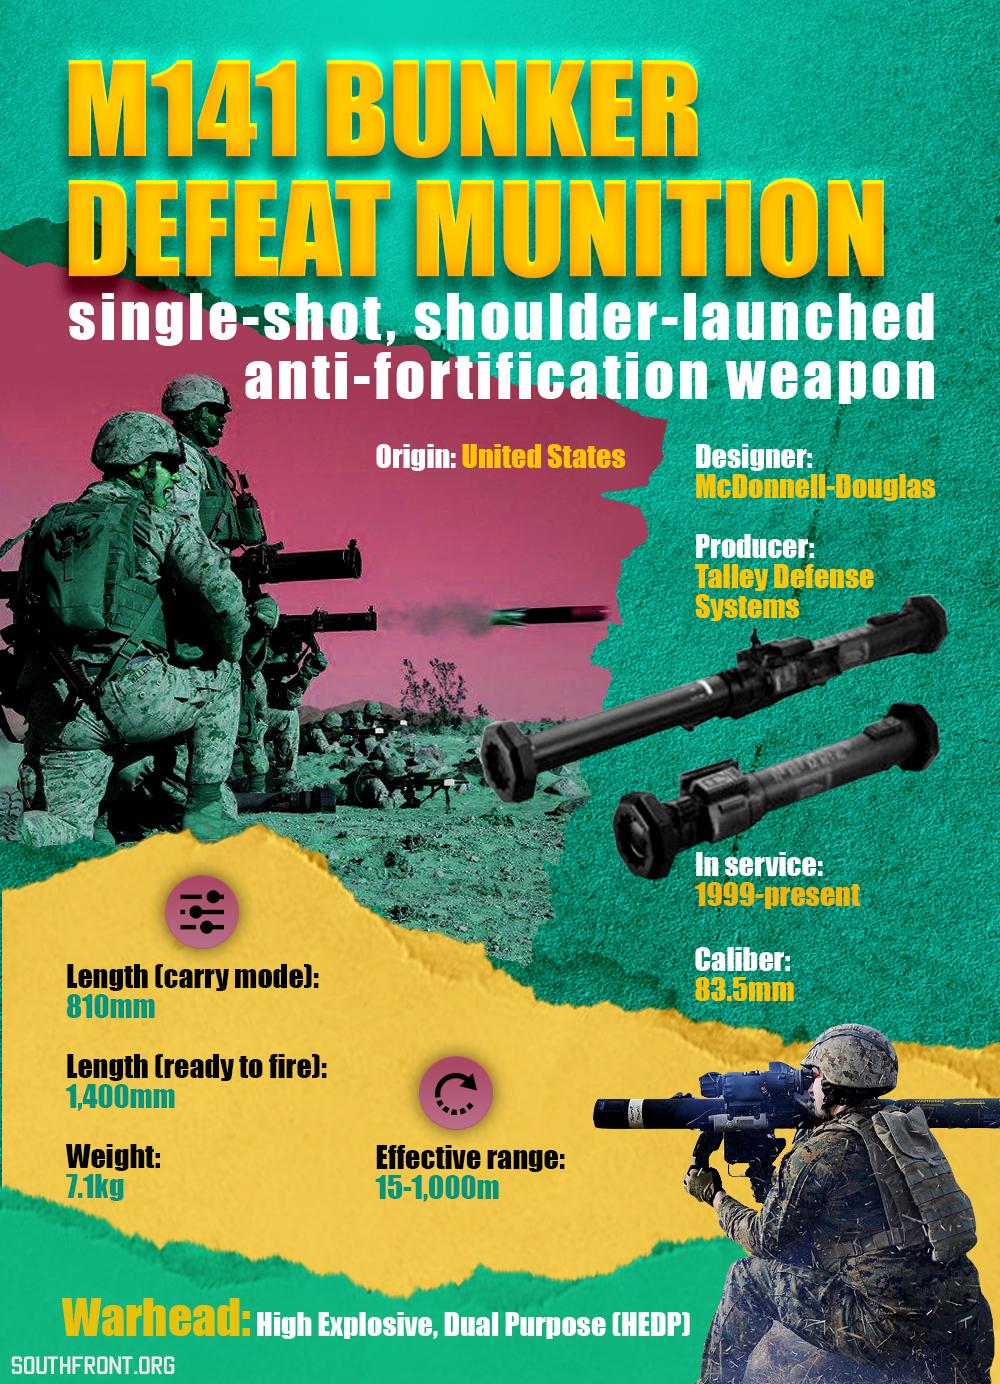 M141 Bunker Defeat Munition (Infographics)